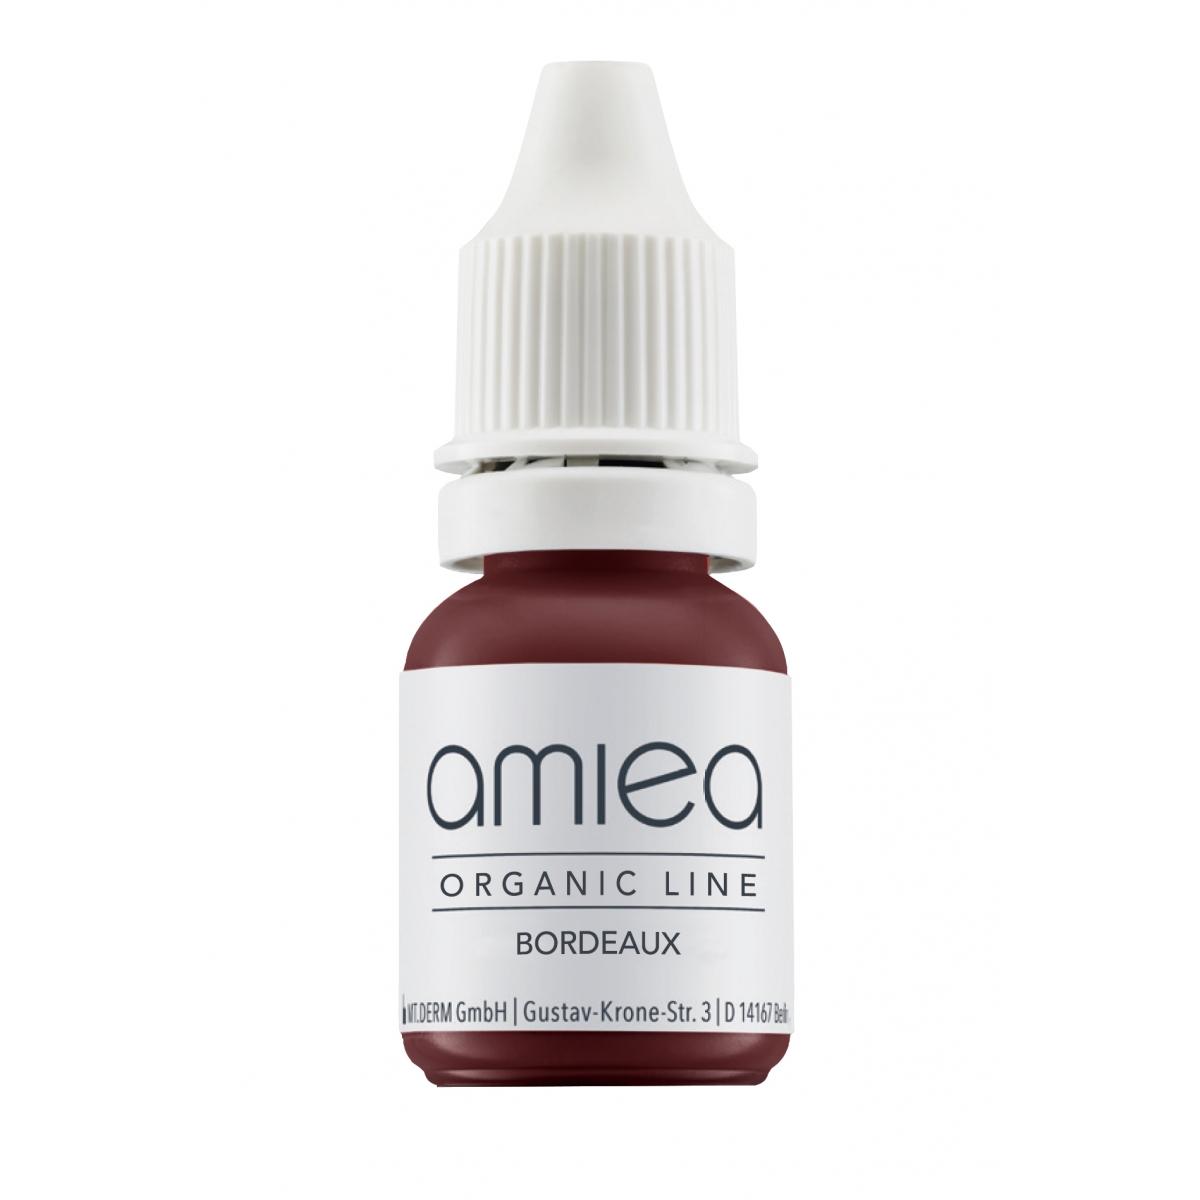 ORGANIC LINE (5ml)  - PIGMENT BORDEAUX ORGANICLINE AMIEA (5 ml)